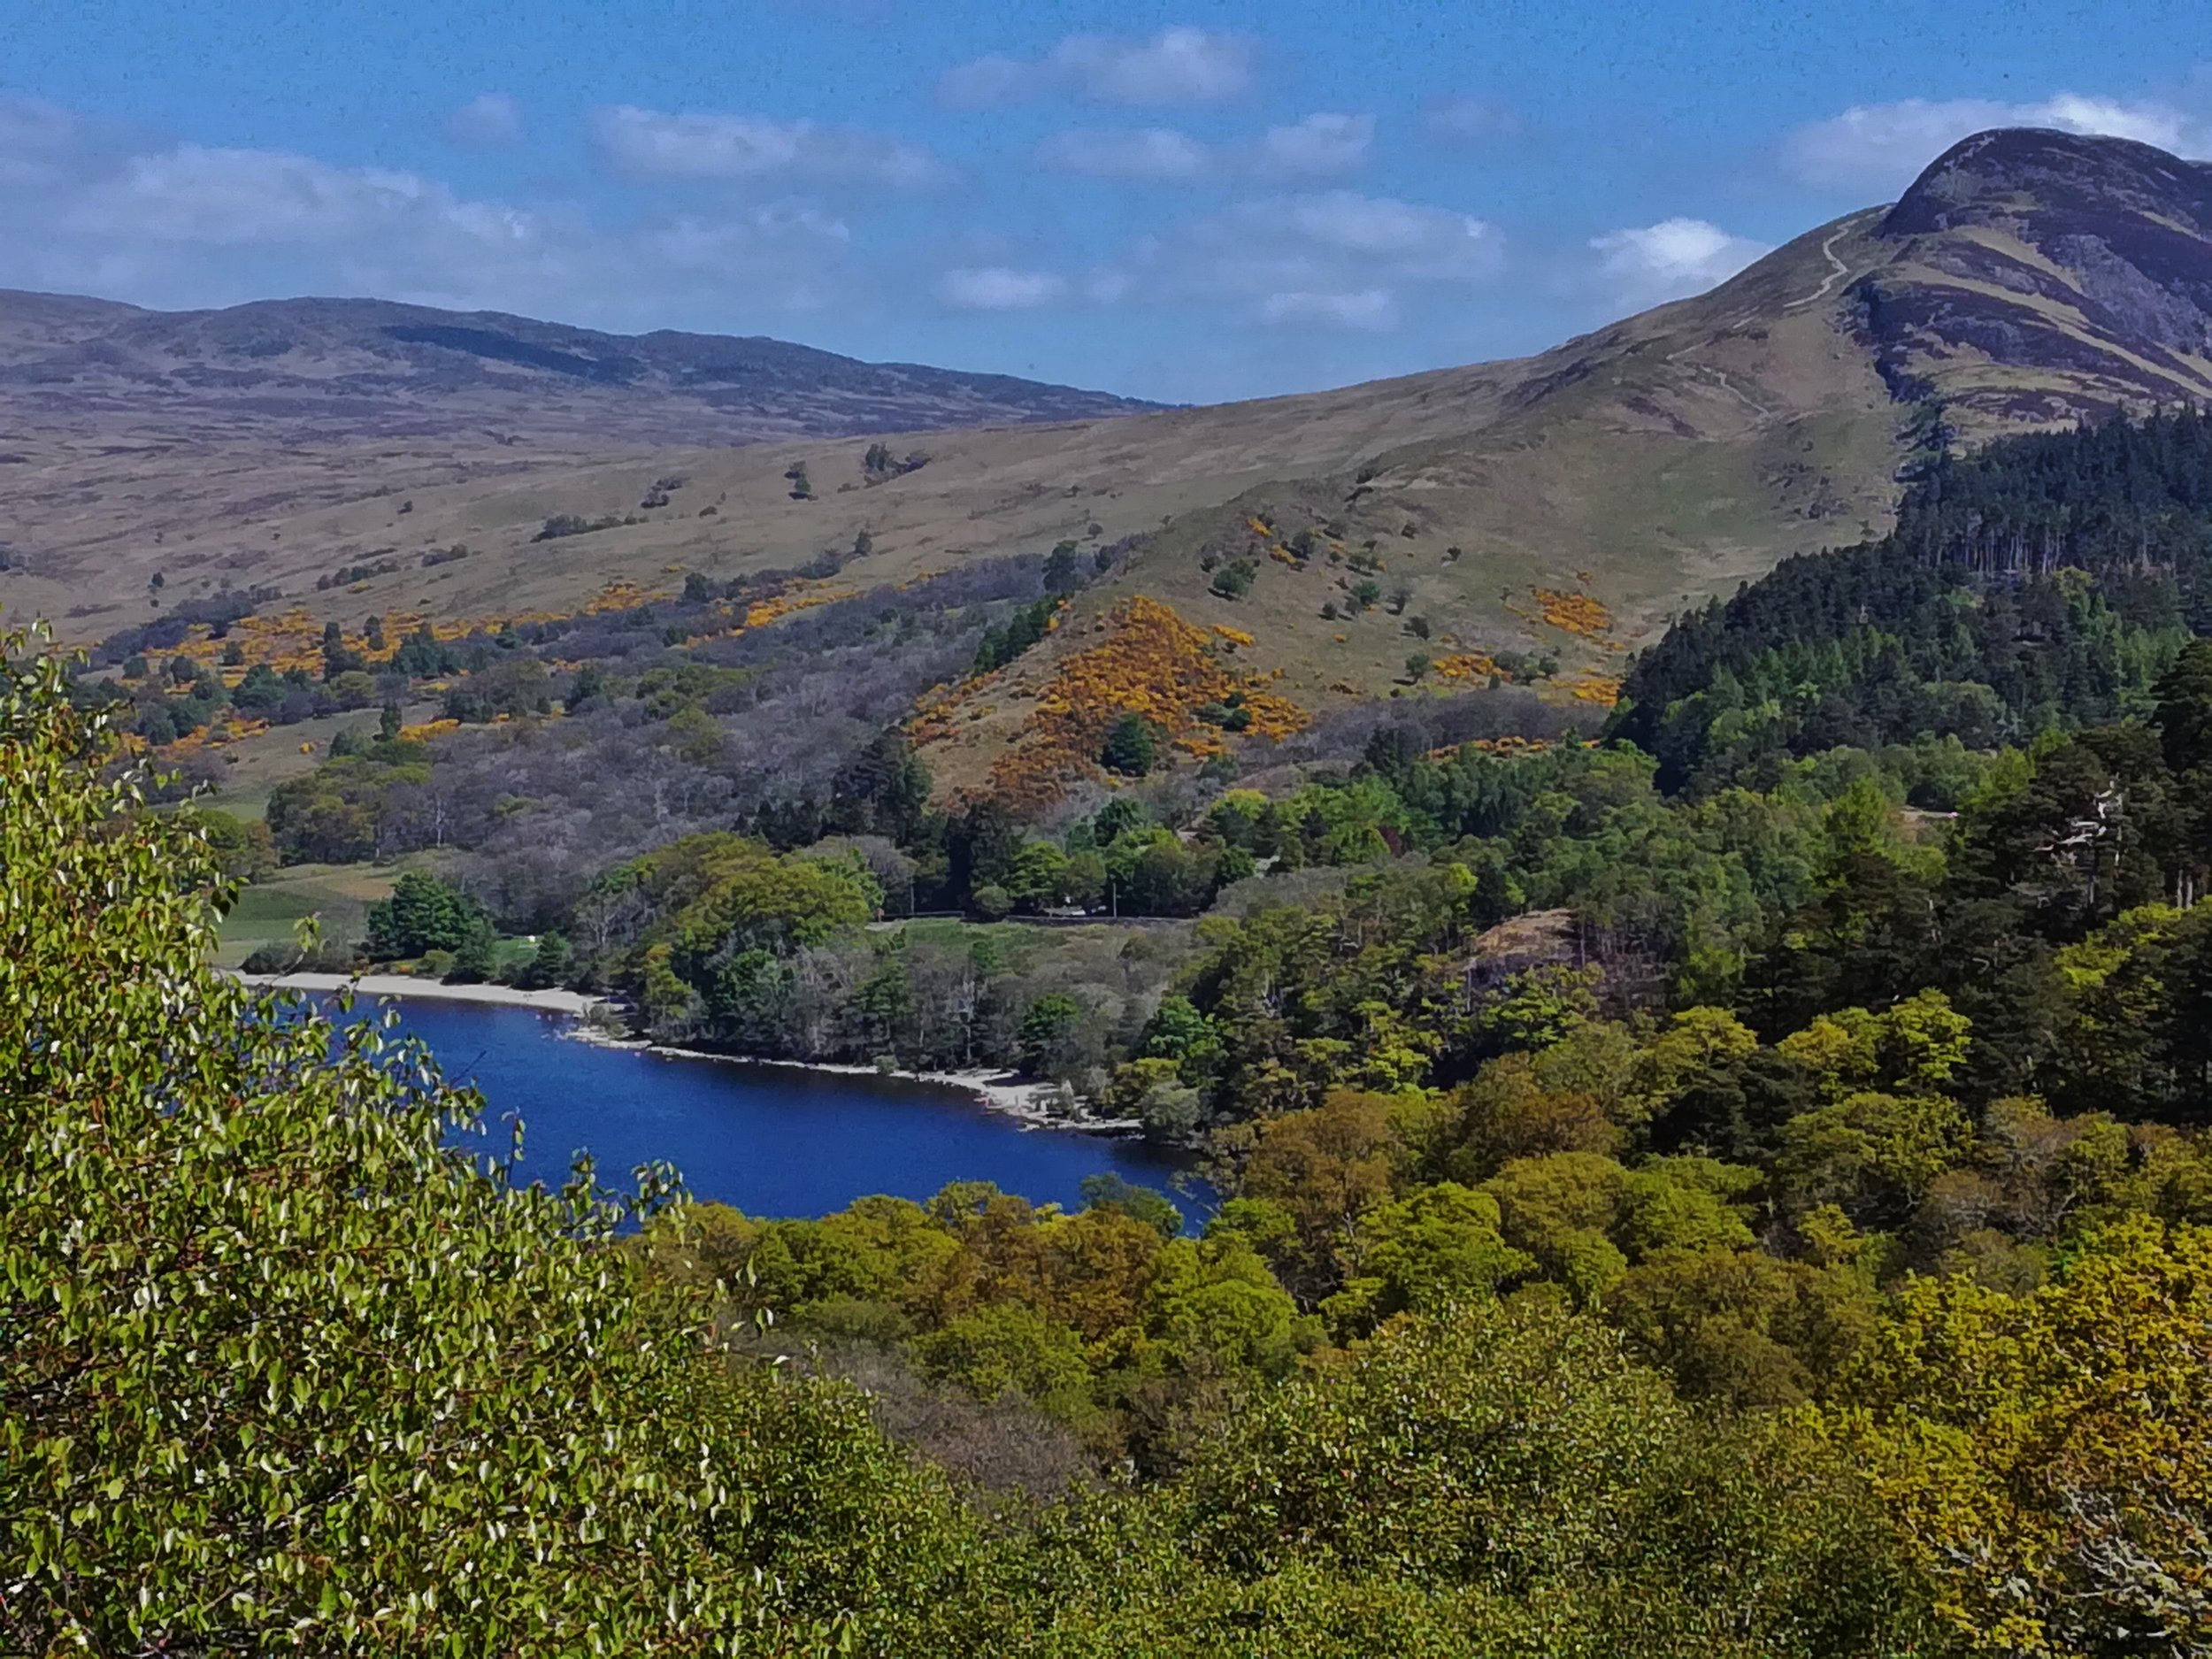 Loch Lomond Inchcaileach Island, Scotland. Day tours with walks from Glasgow, small group adventures, Roaming Scotland.JPG